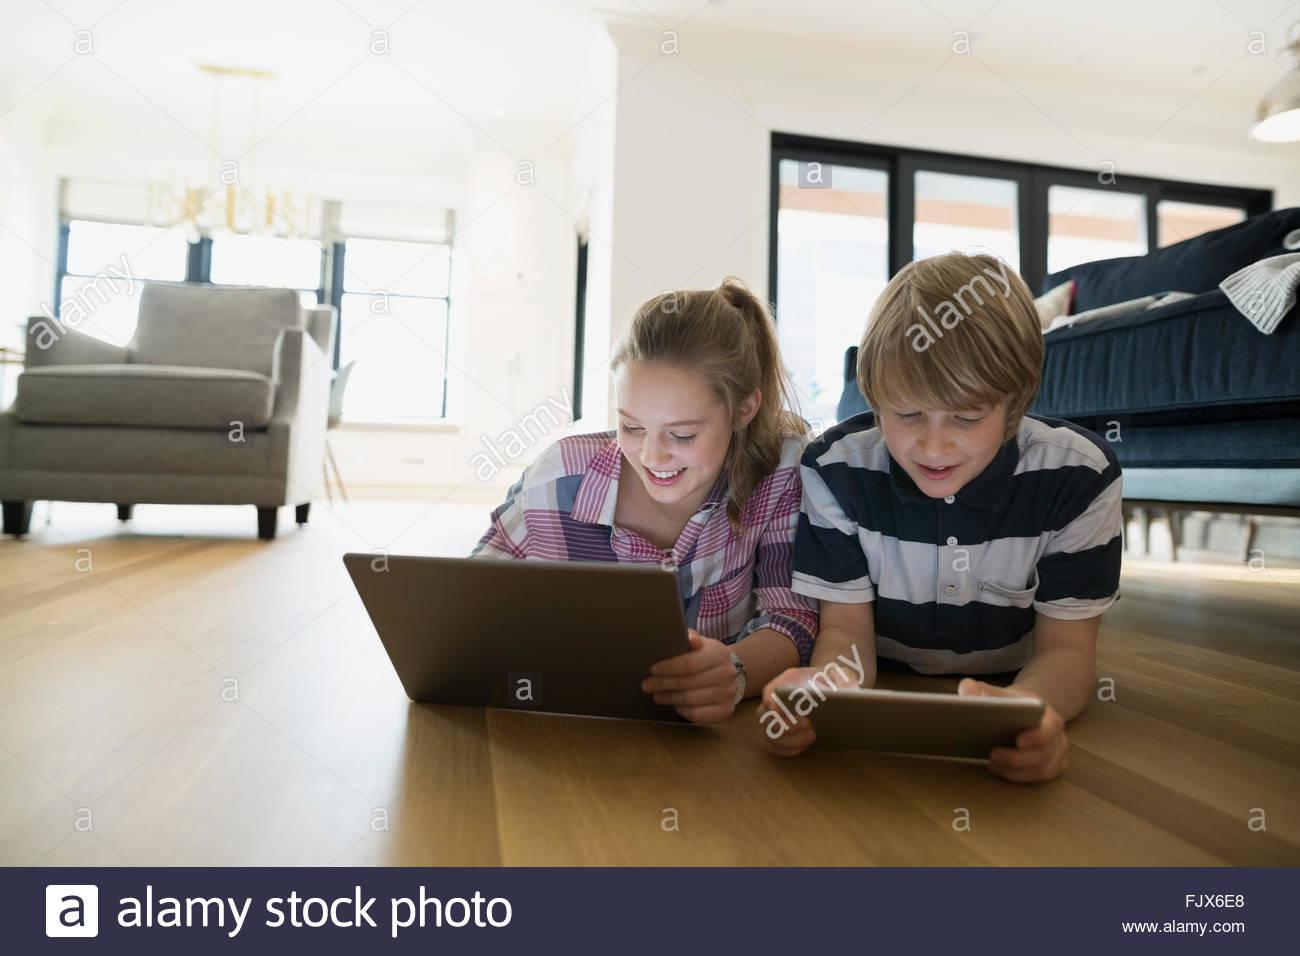 Brother sister using digital tablets living room floor - Stock Image